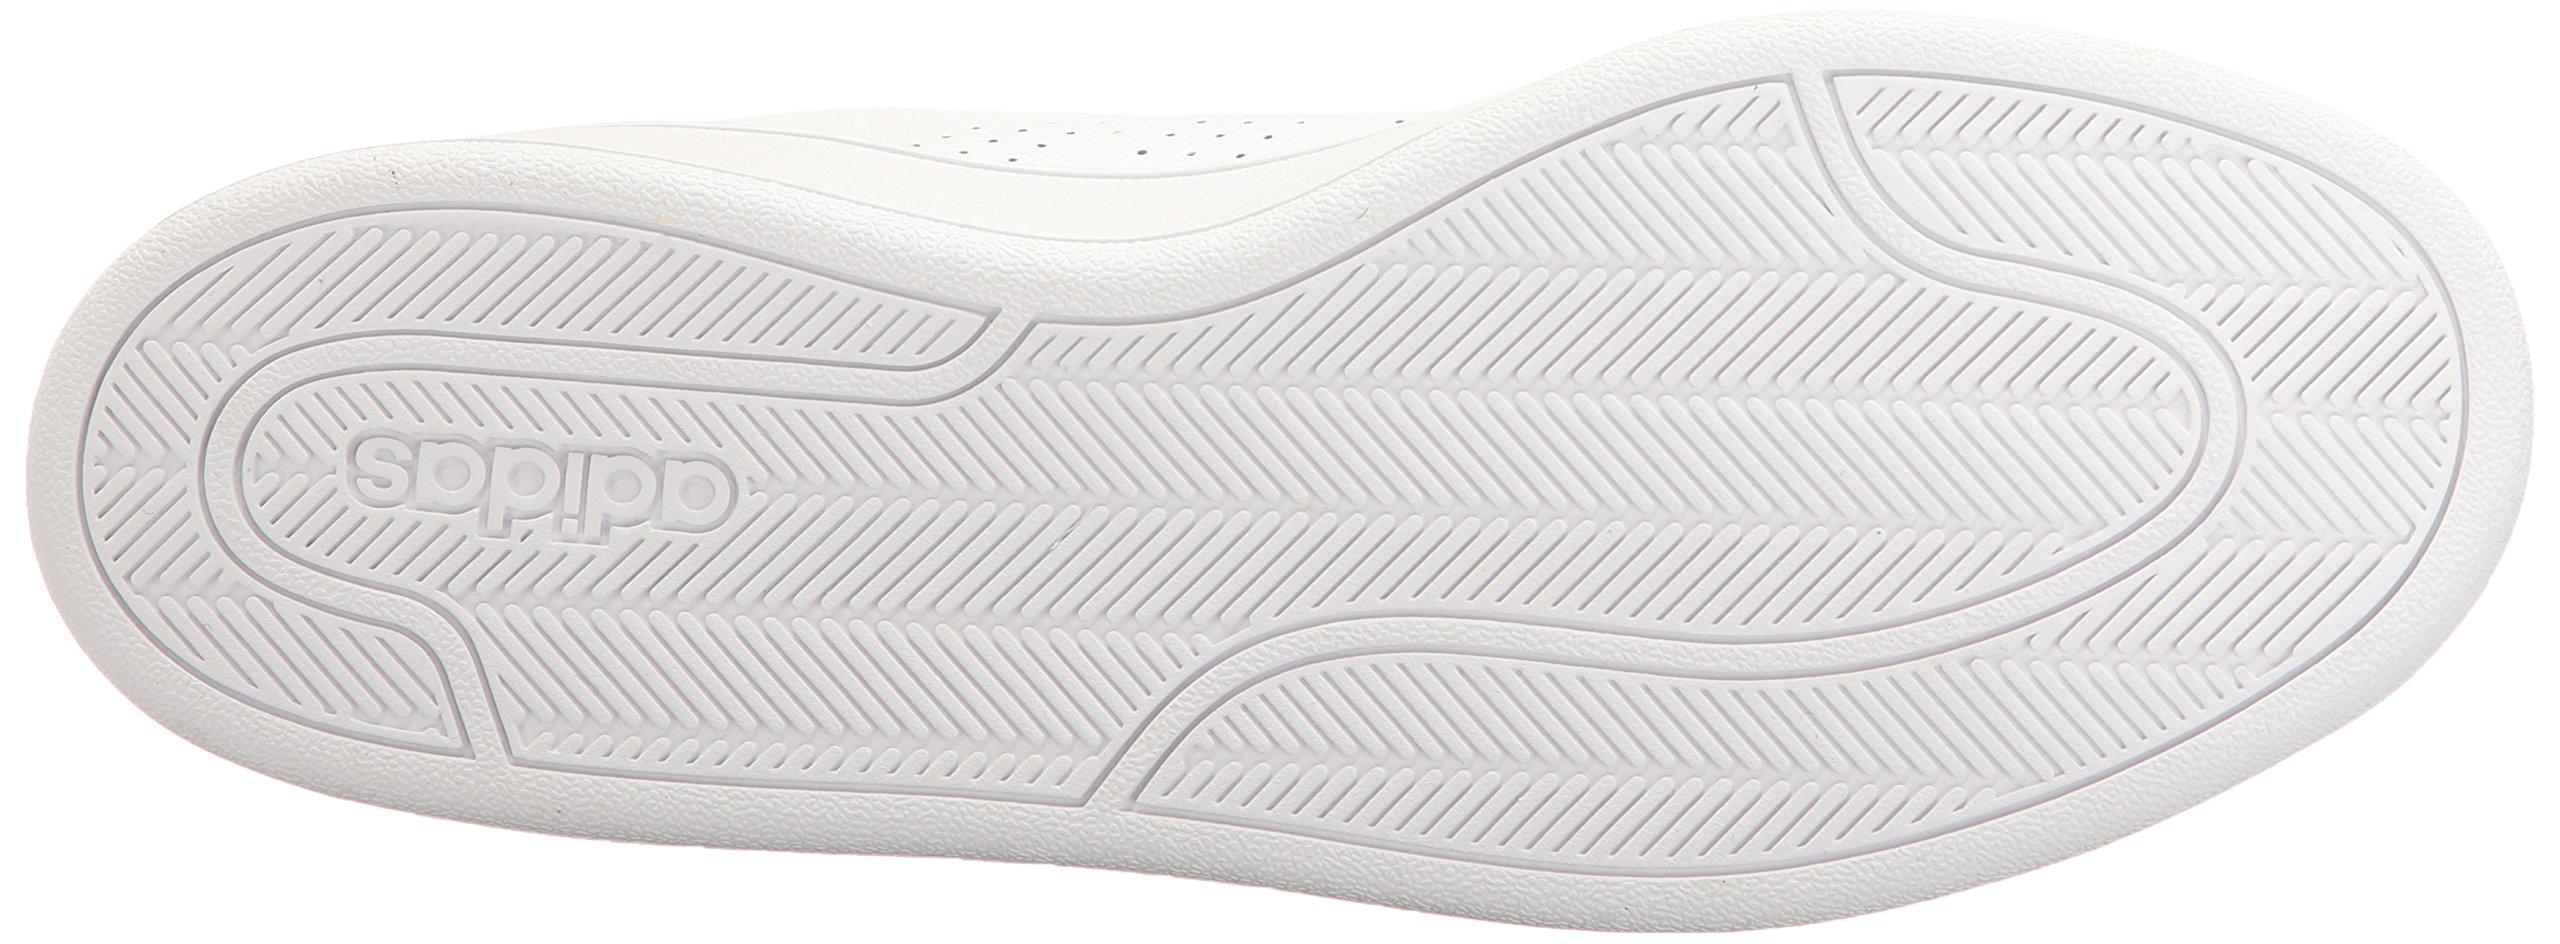 adidas Women's Shoes Cloudfoam Advantage Clean Sneakers, White/White/Black, (7.5 M US) by adidas (Image #3)